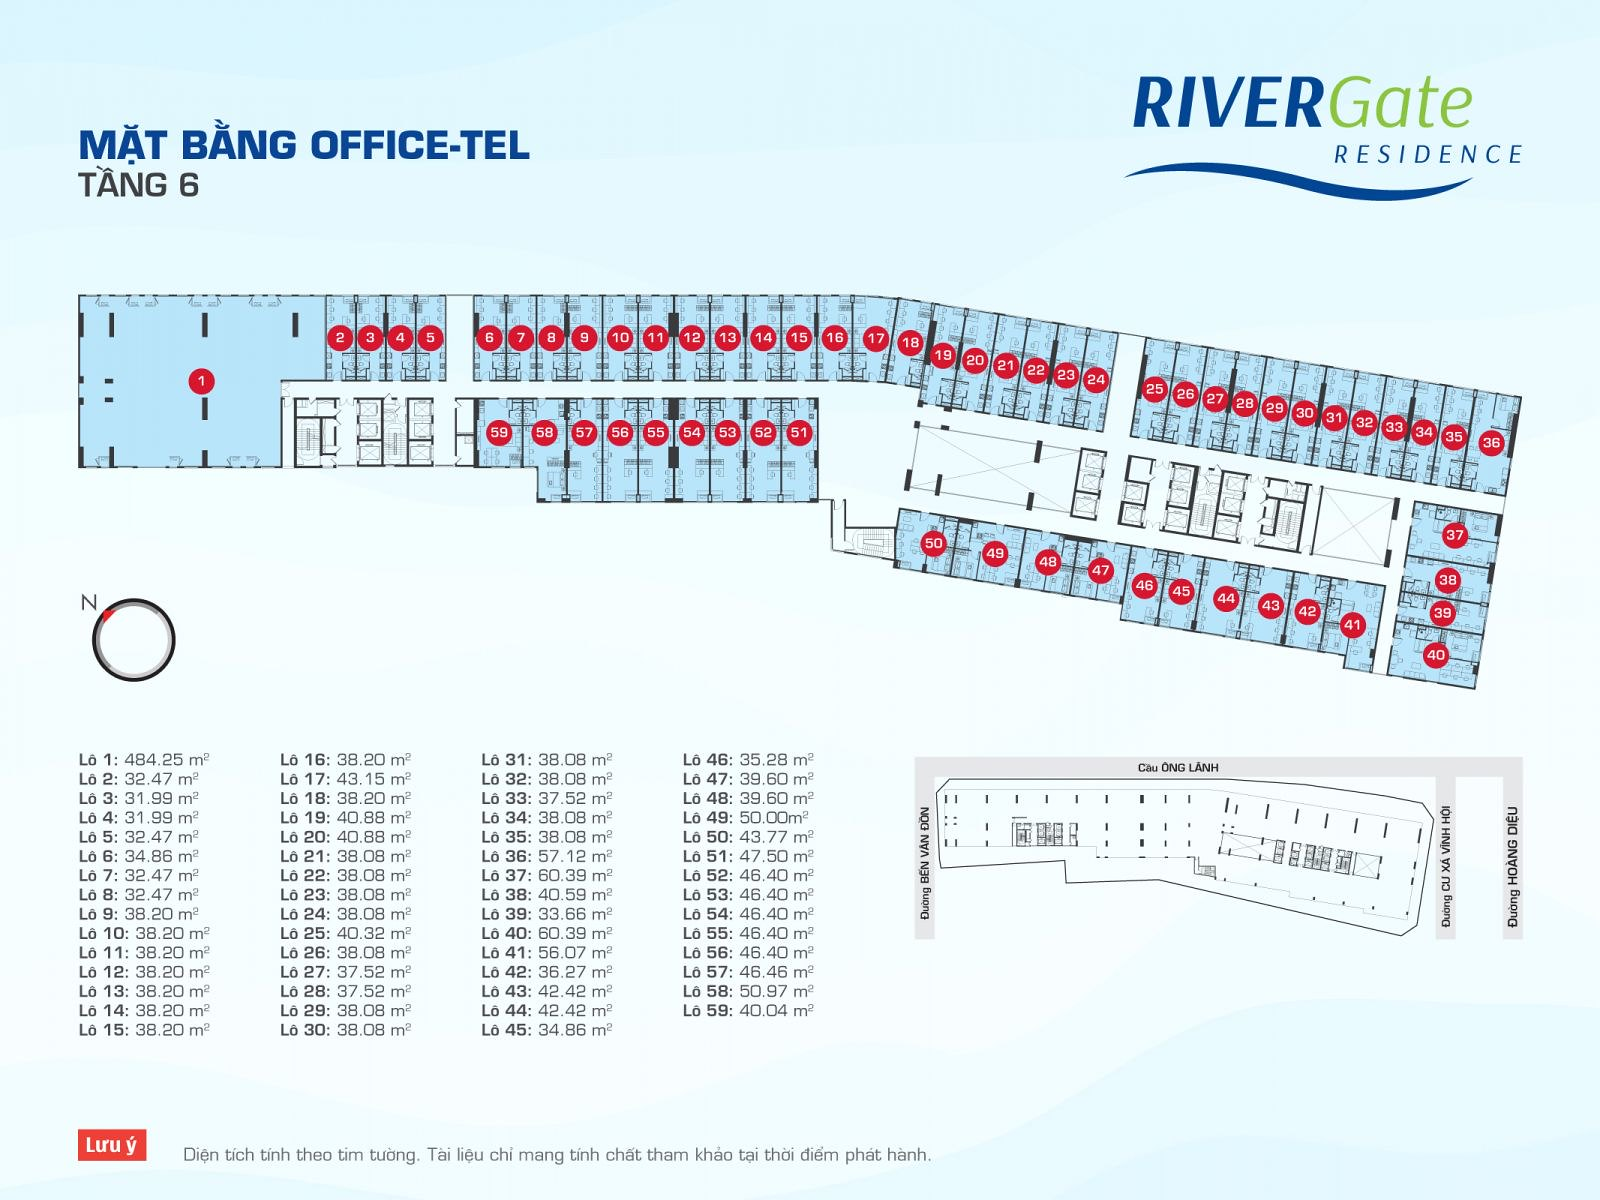 Mặt bằng OfficeTel RiverGate tầng 6